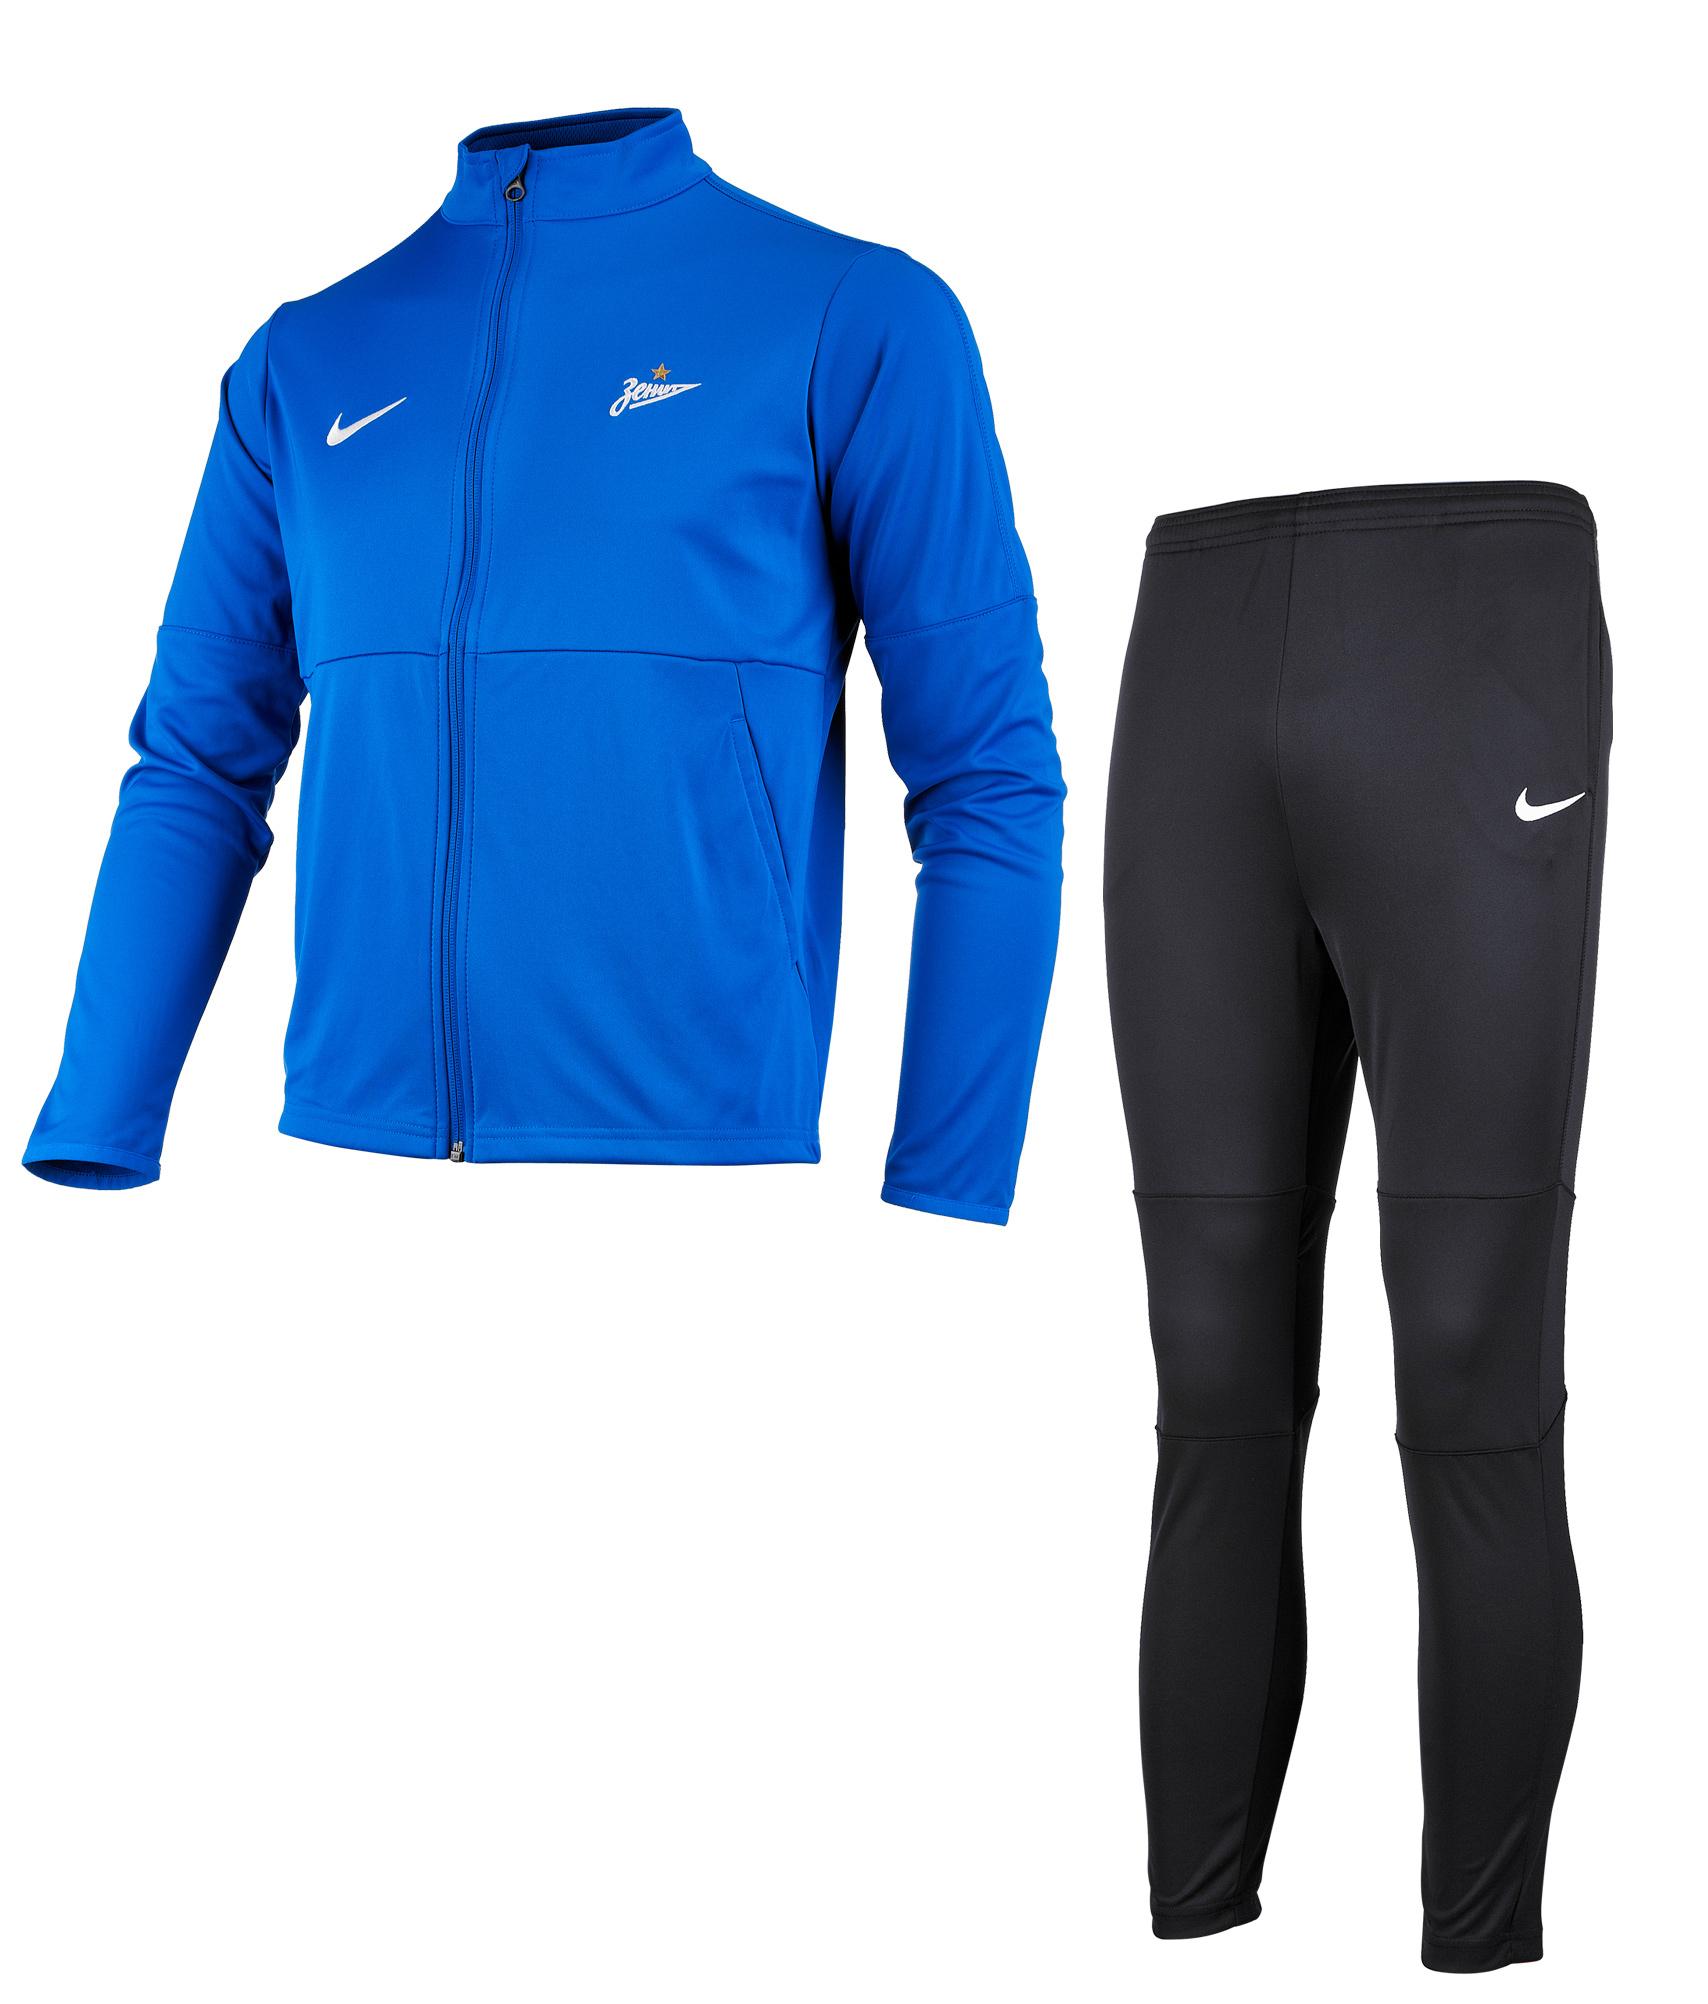 Спортивный костюм подростковый Nike Zenit Nike